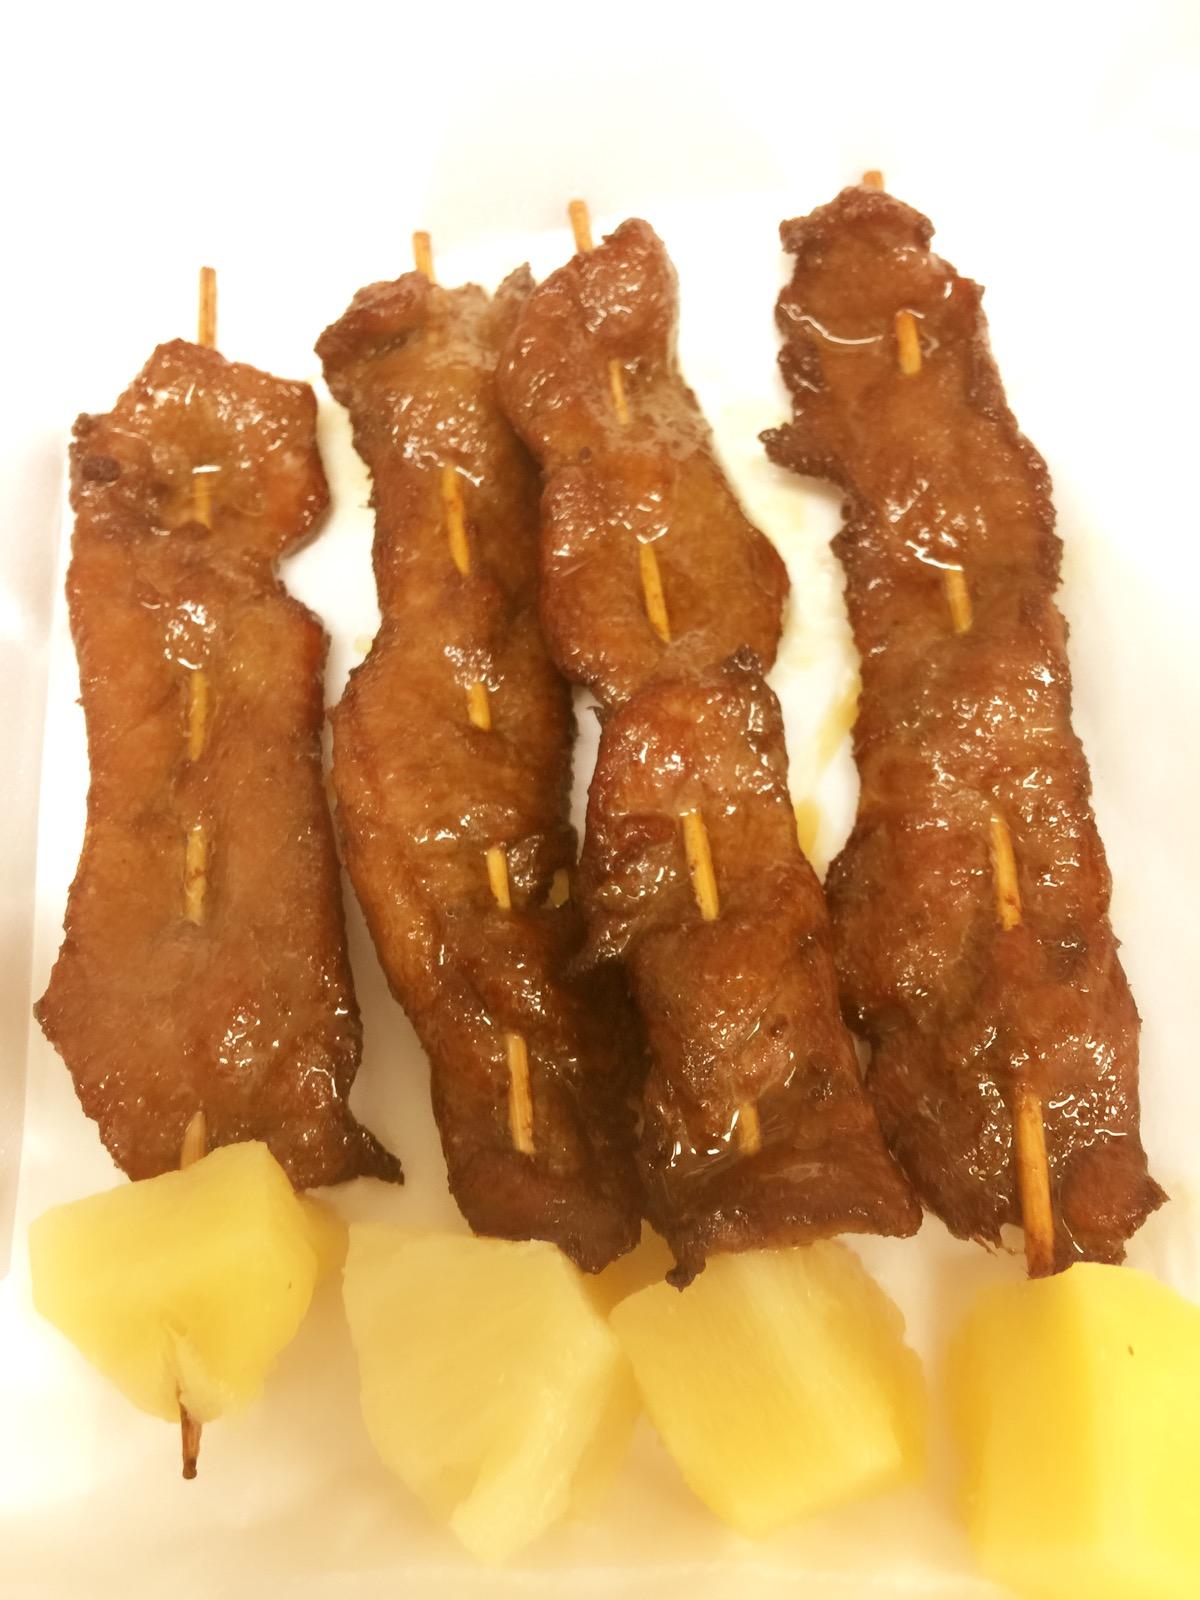 7. Beef Stick (4) Image